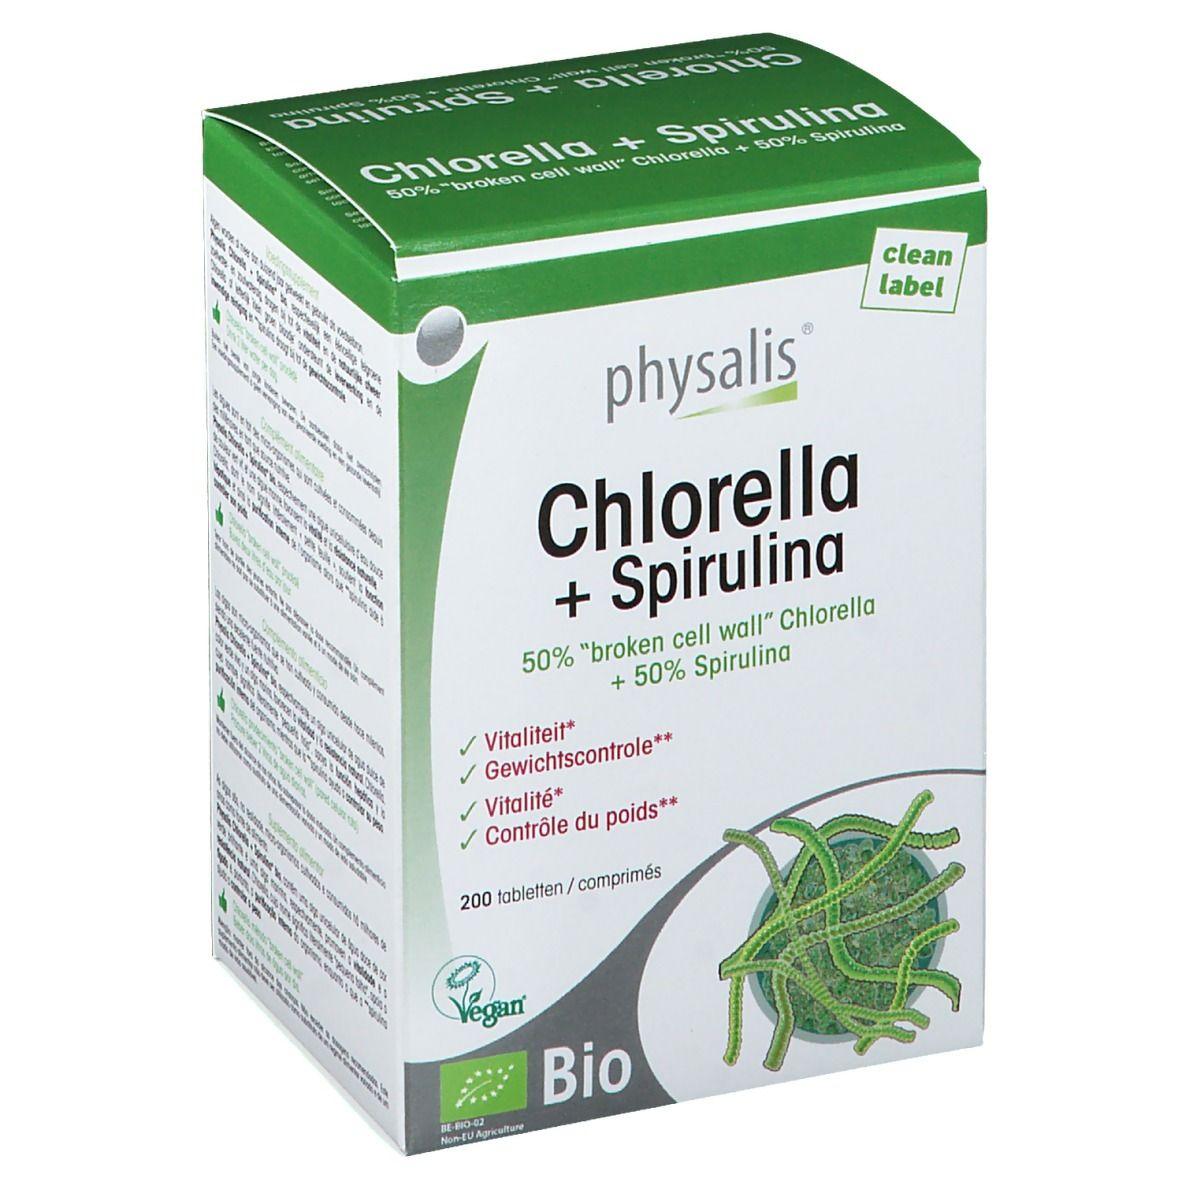 physalis chlorella spirulina bio